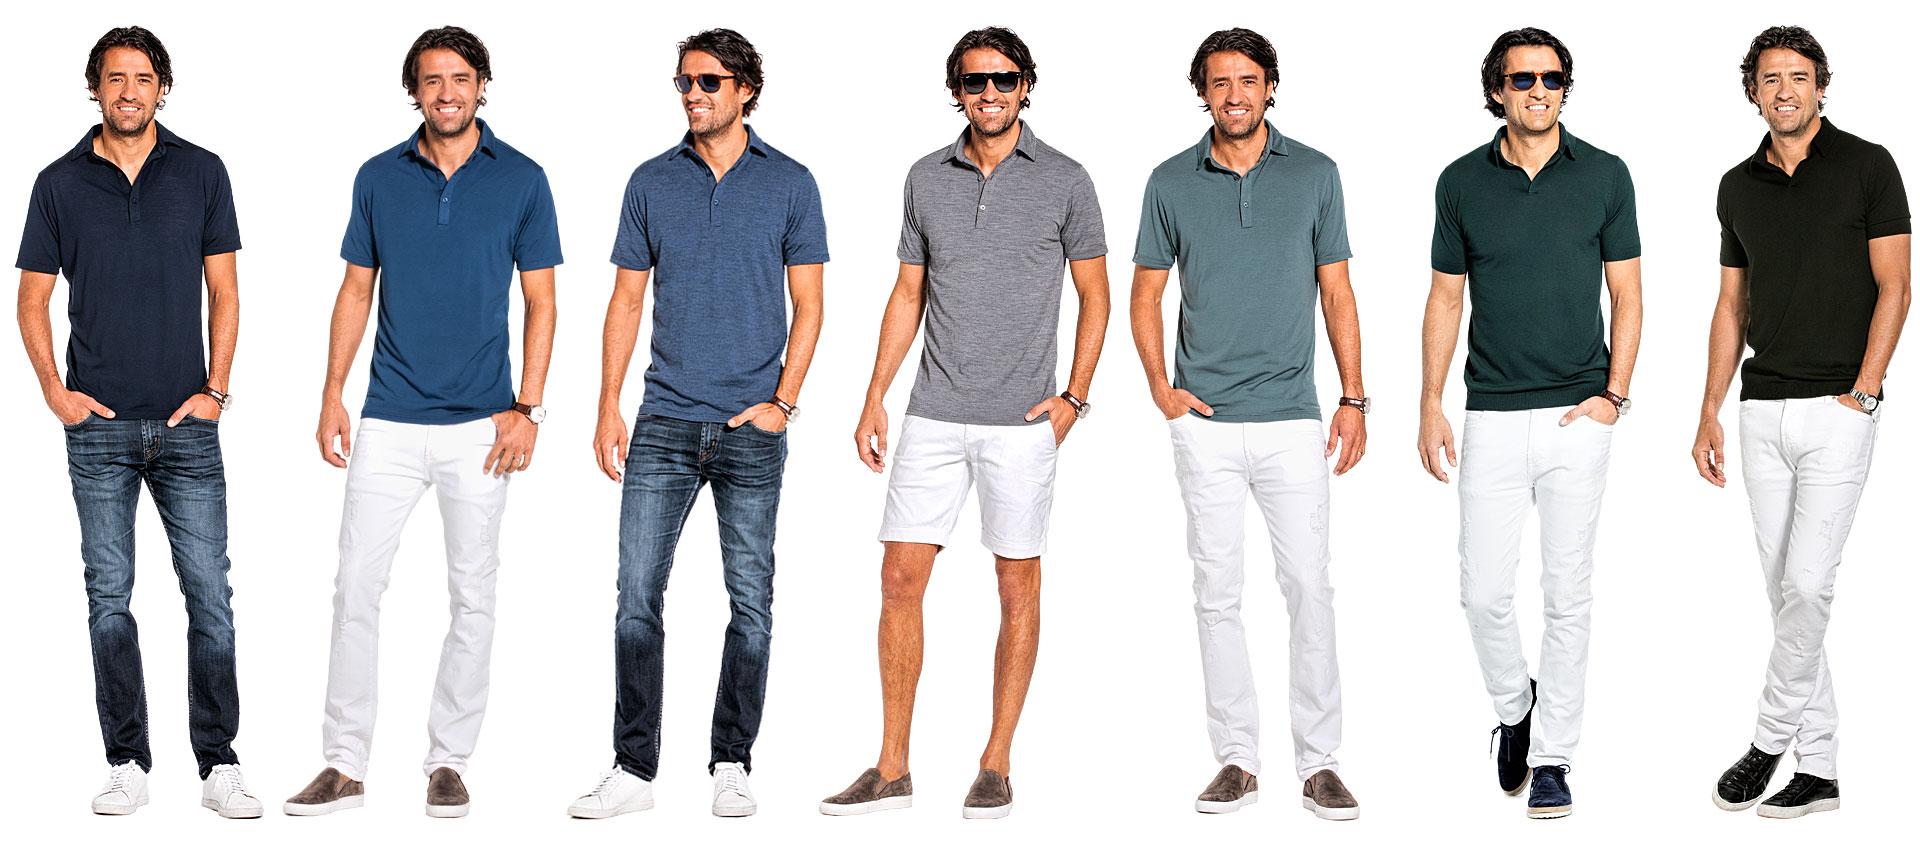 Merino Polo Shirt für Herren kaufen bei Joe Merino, exklusive Merino-Herrenbekleidung online.